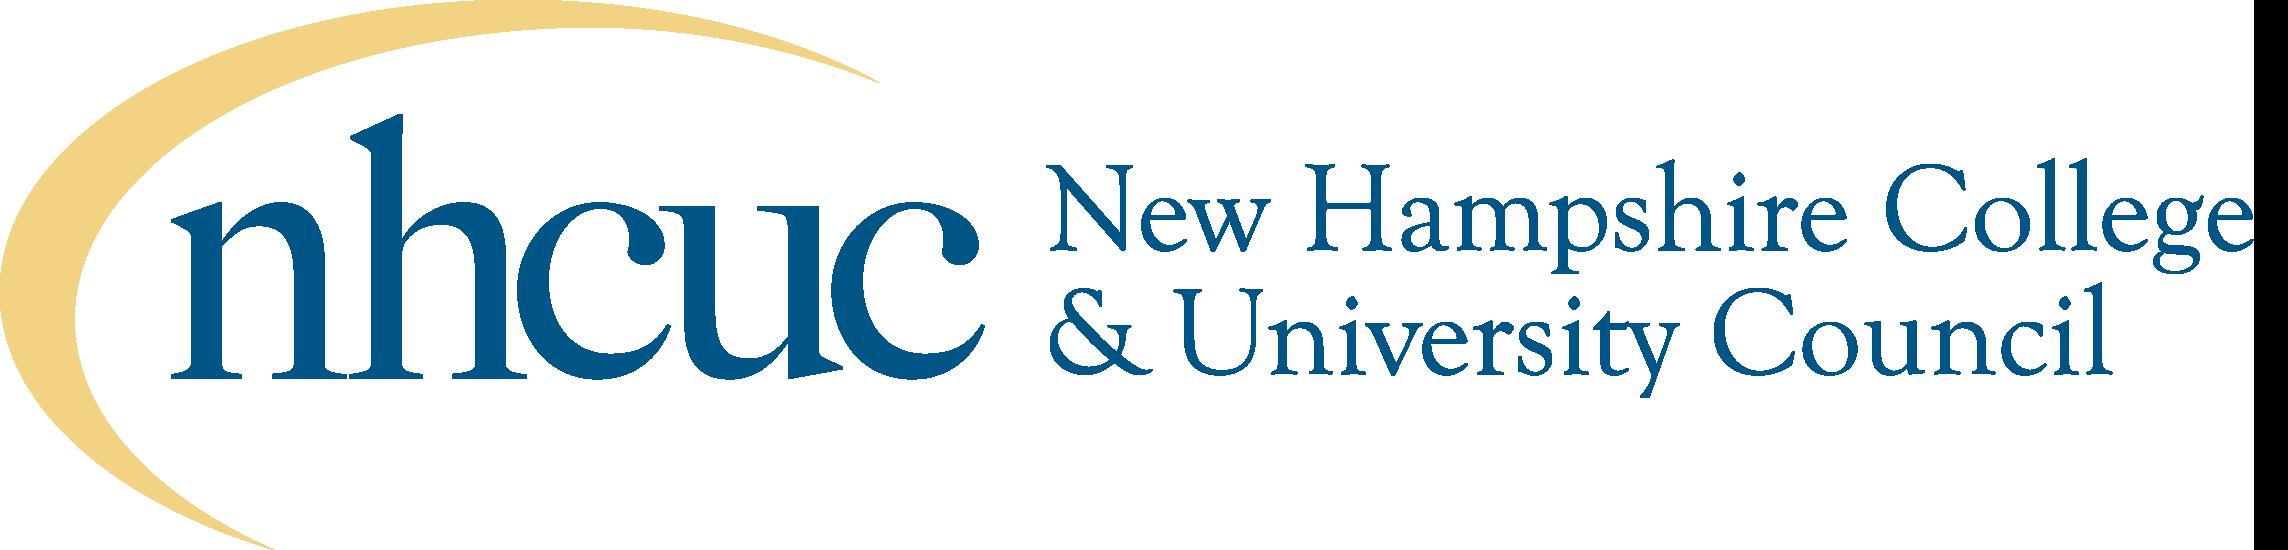 New Hampshire College & University Council